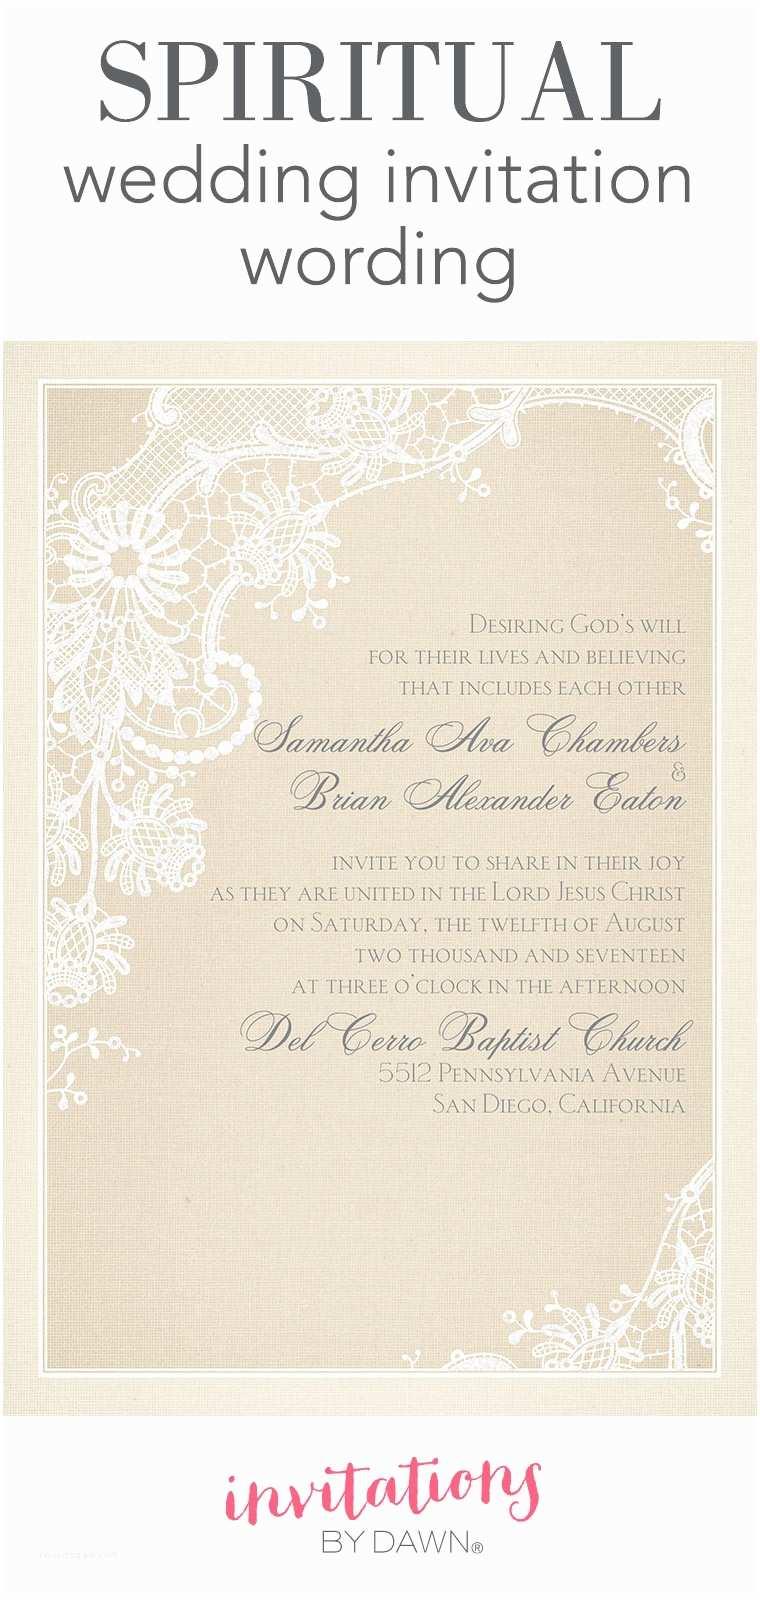 Christian Wedding Invitation Wording Unique Christian Wedding Invitation Wording Quotes